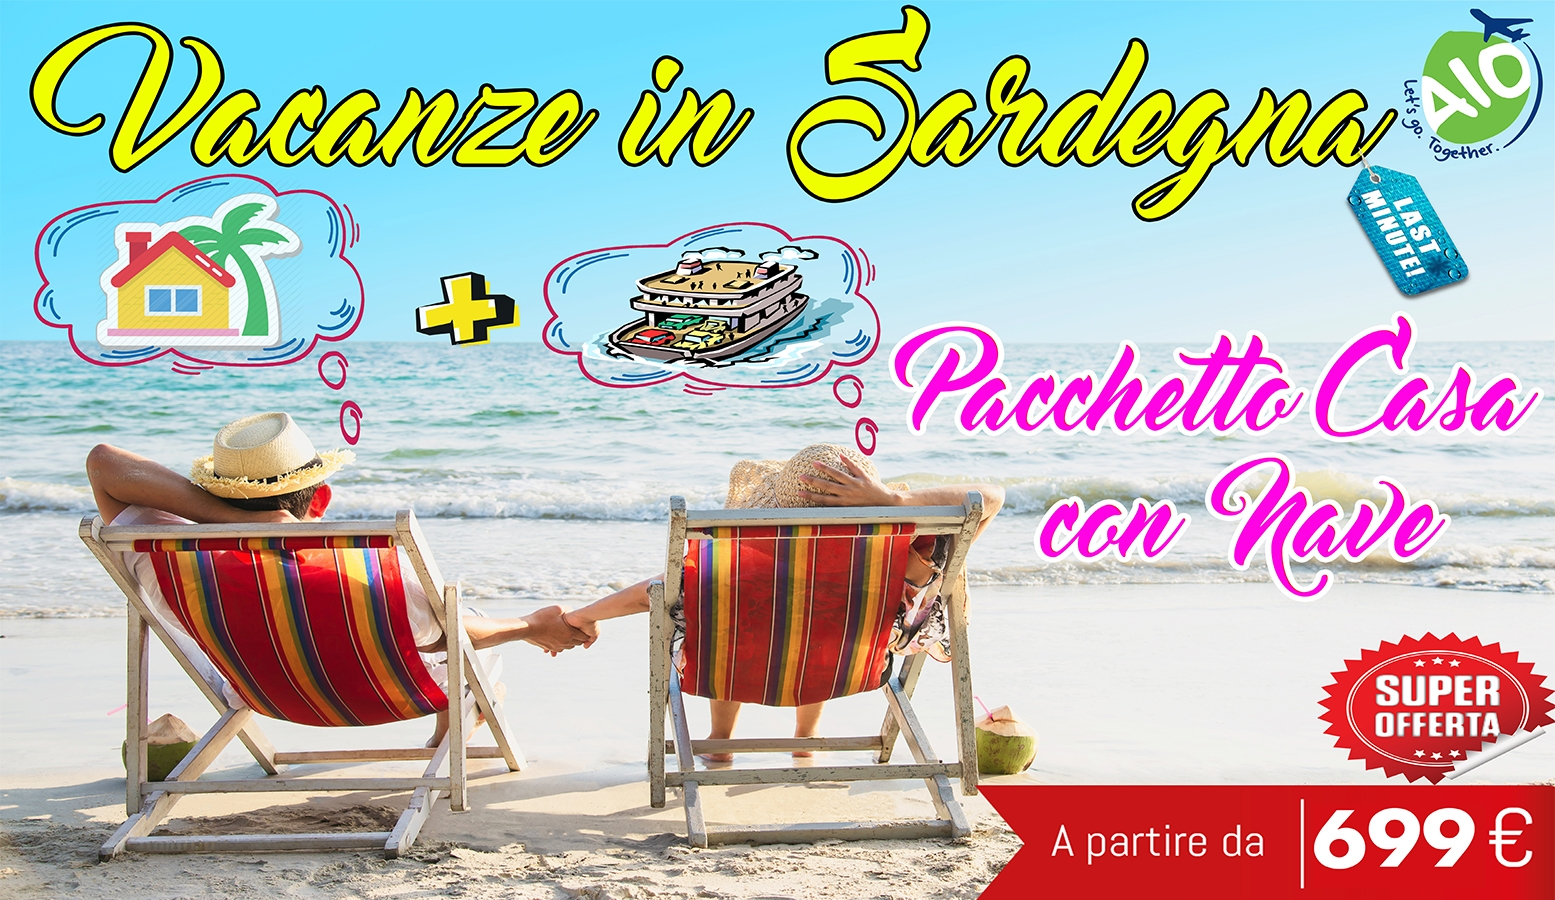 Last Minute Offerte Estate 2019 in Sardegna Casa Vacanza + Nave Low Cost